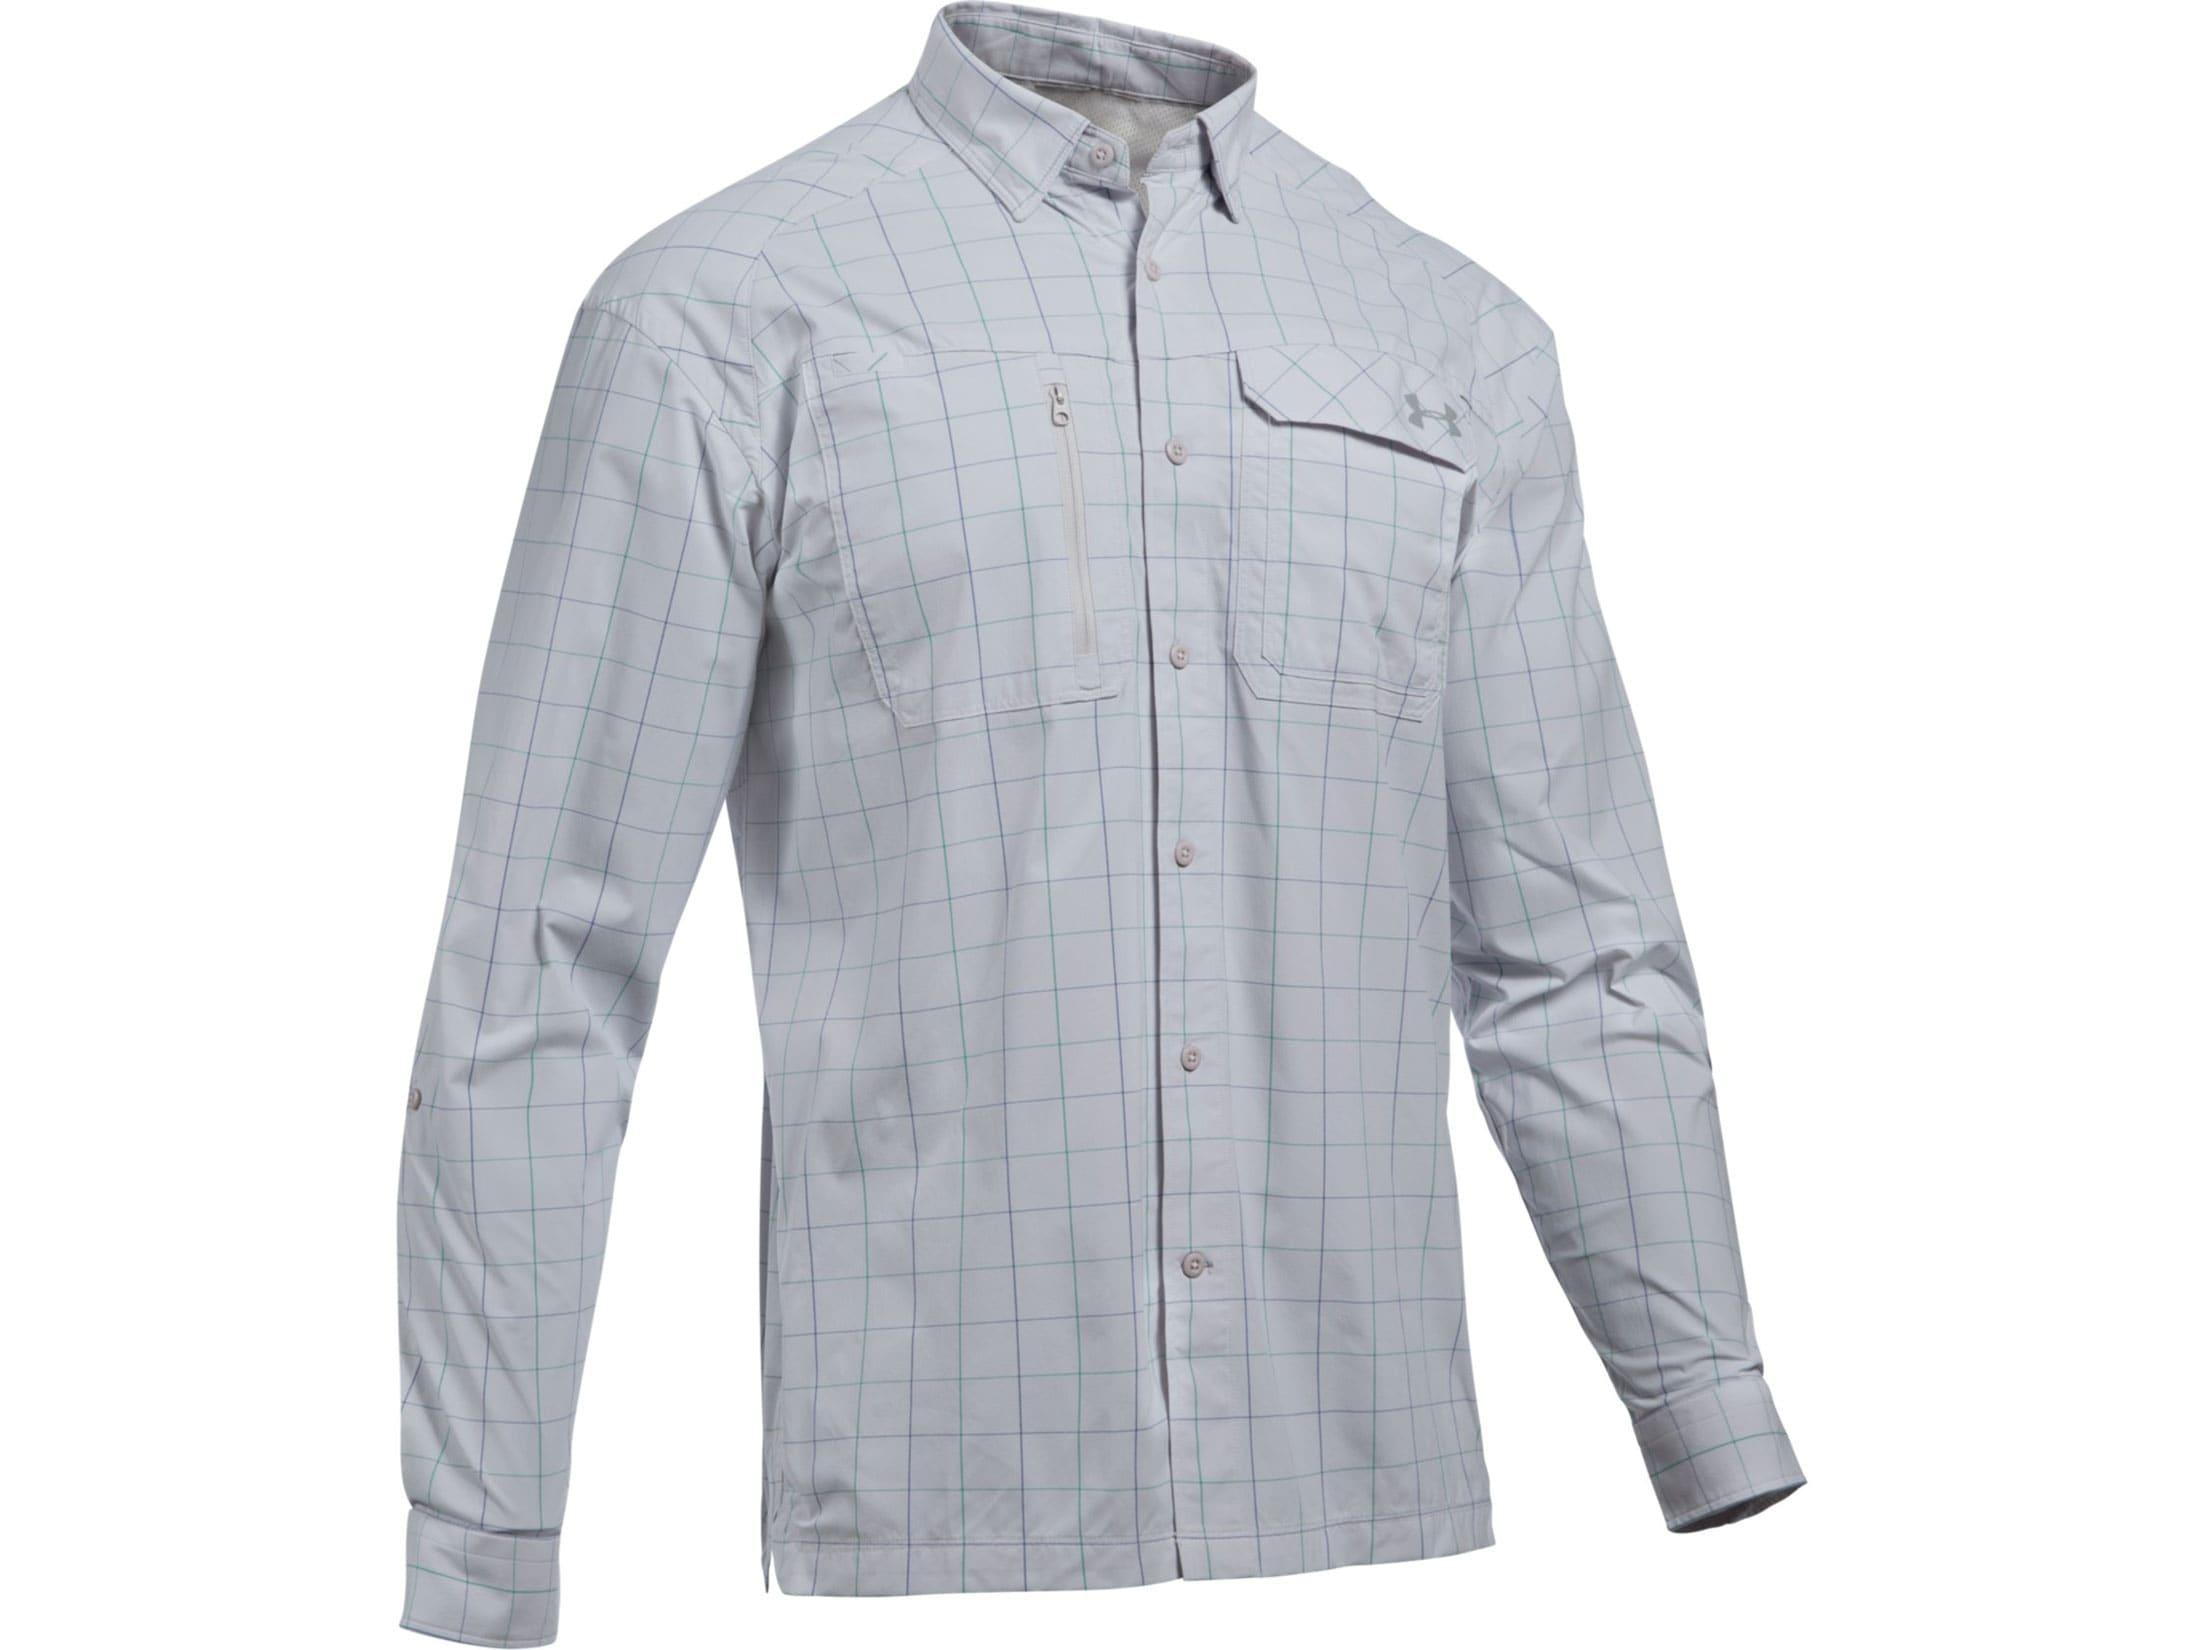 a8de816806 Under Armour Men's UA Fish Hunter Plaid Button-Up Shirt Long Sleeve